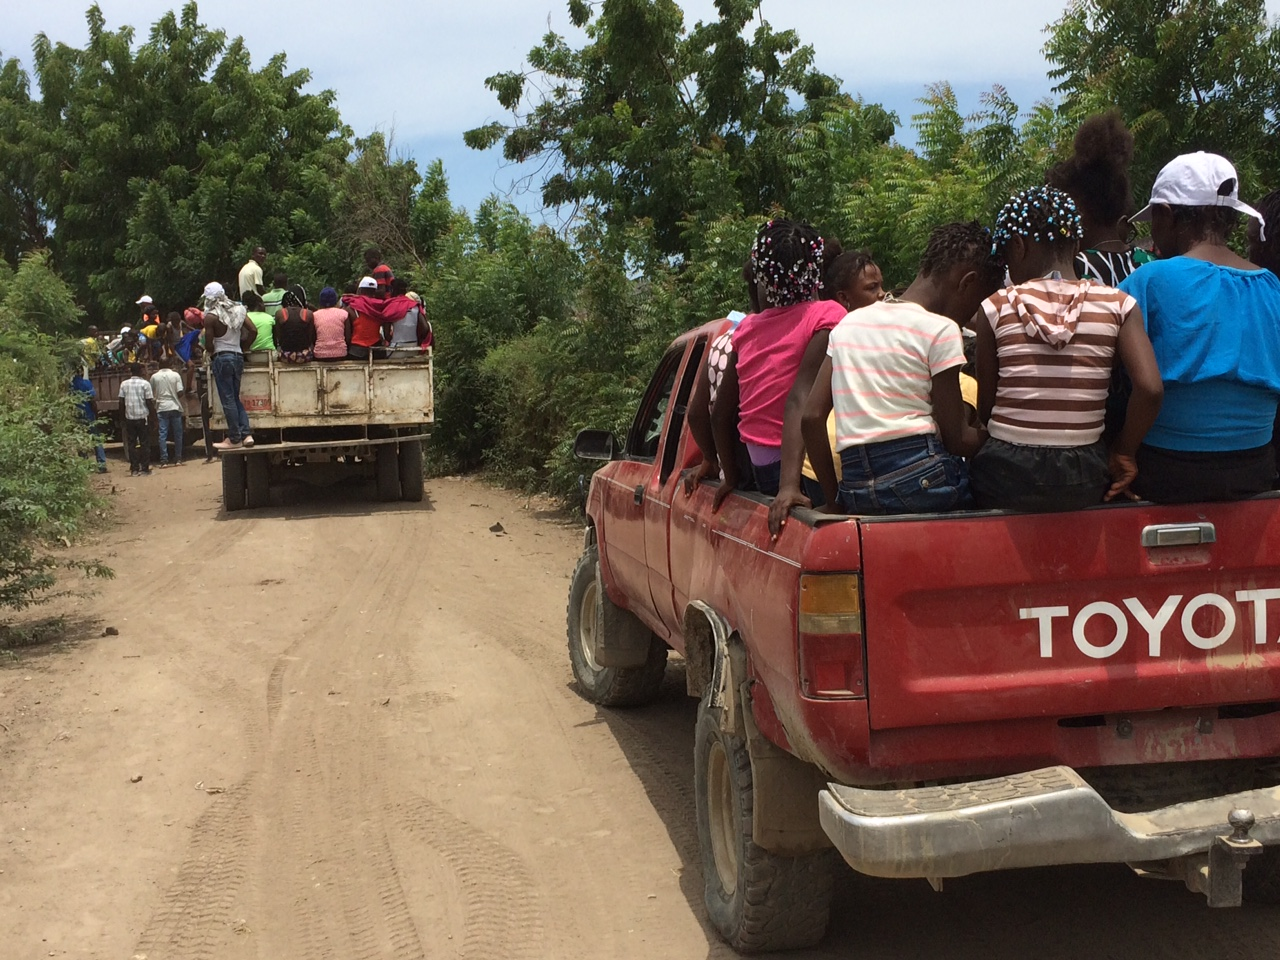 The children where brought to the Bouflette children's camp via trucks from across the region.